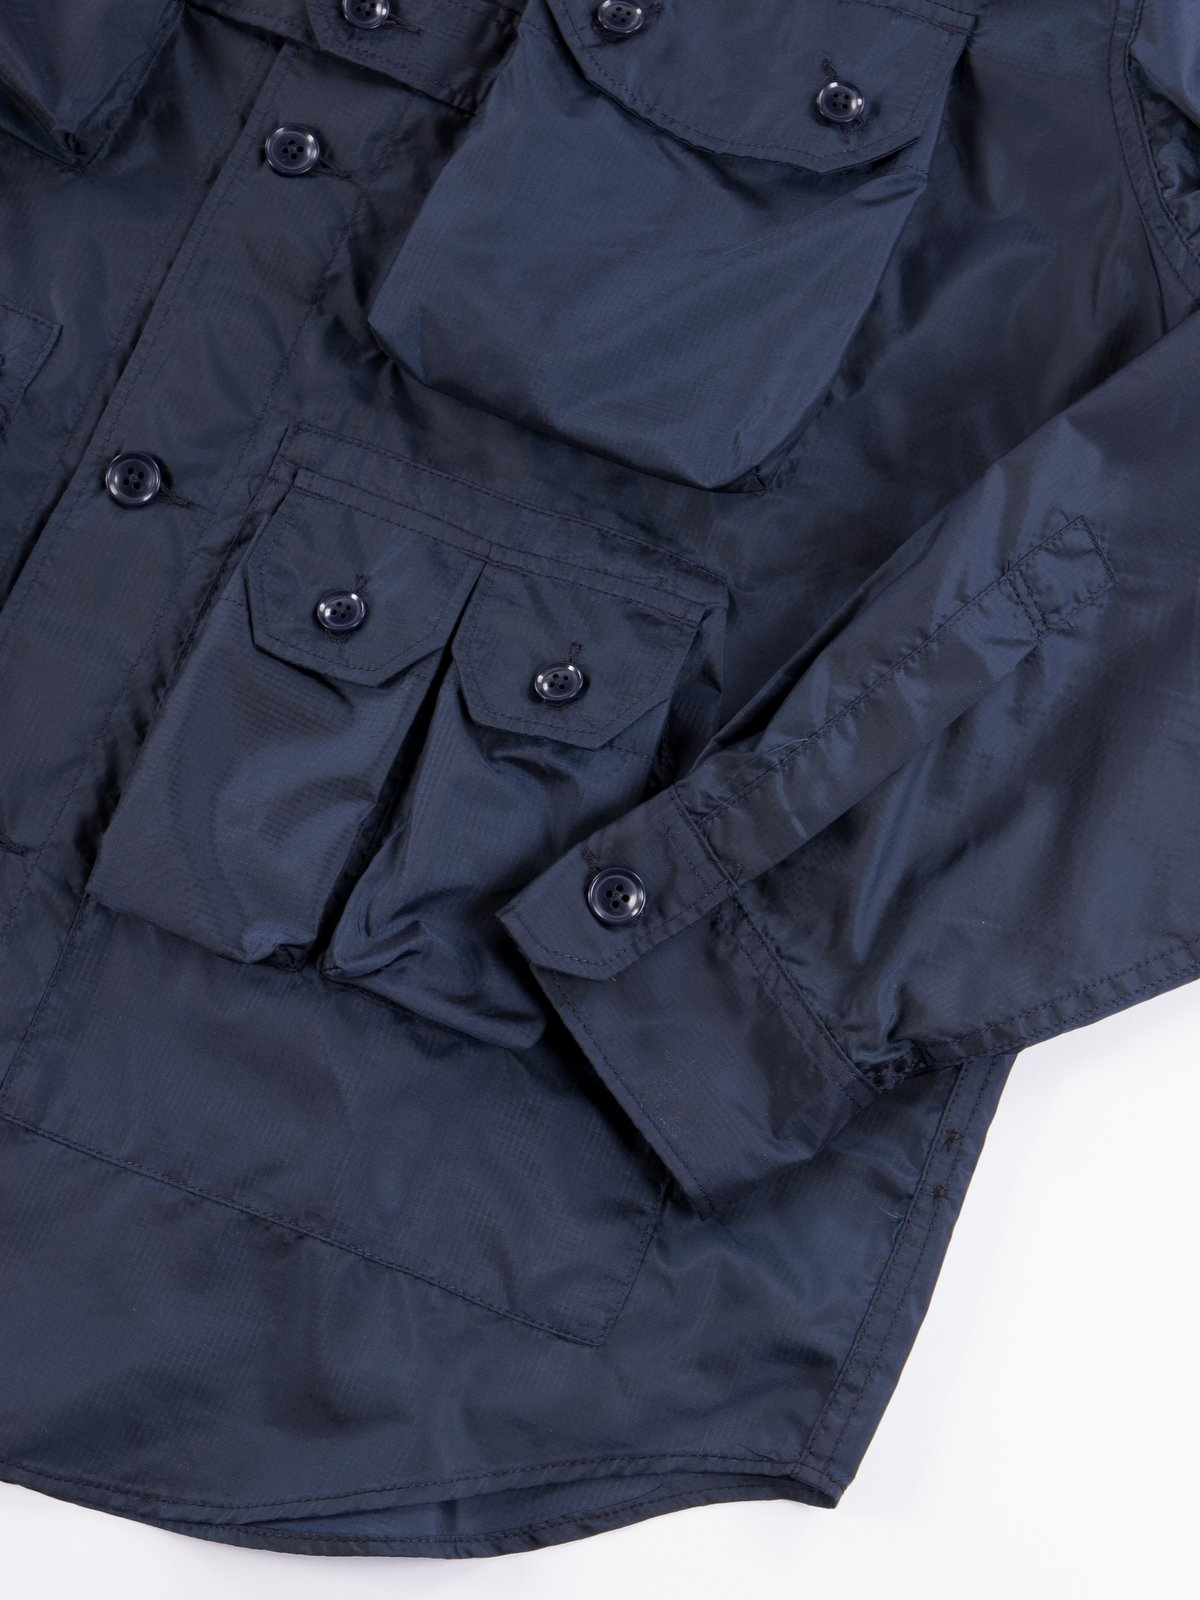 Navy Nylon Micro Ripstop Explorer Shirt Jacket  - Image 6